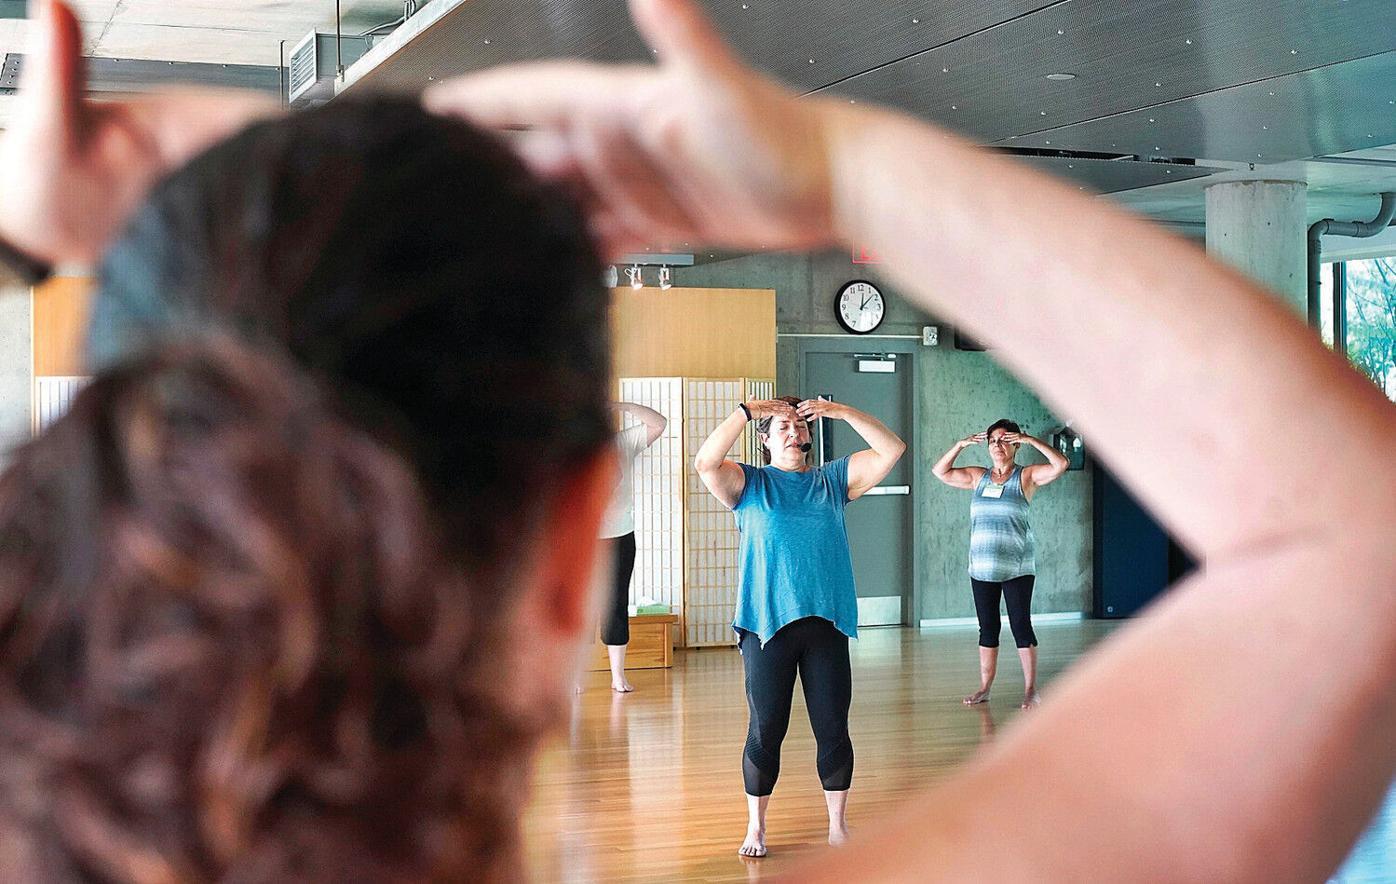 Report cites Kripalu's boost to local economy's wellness, $56M impact in Berkshires